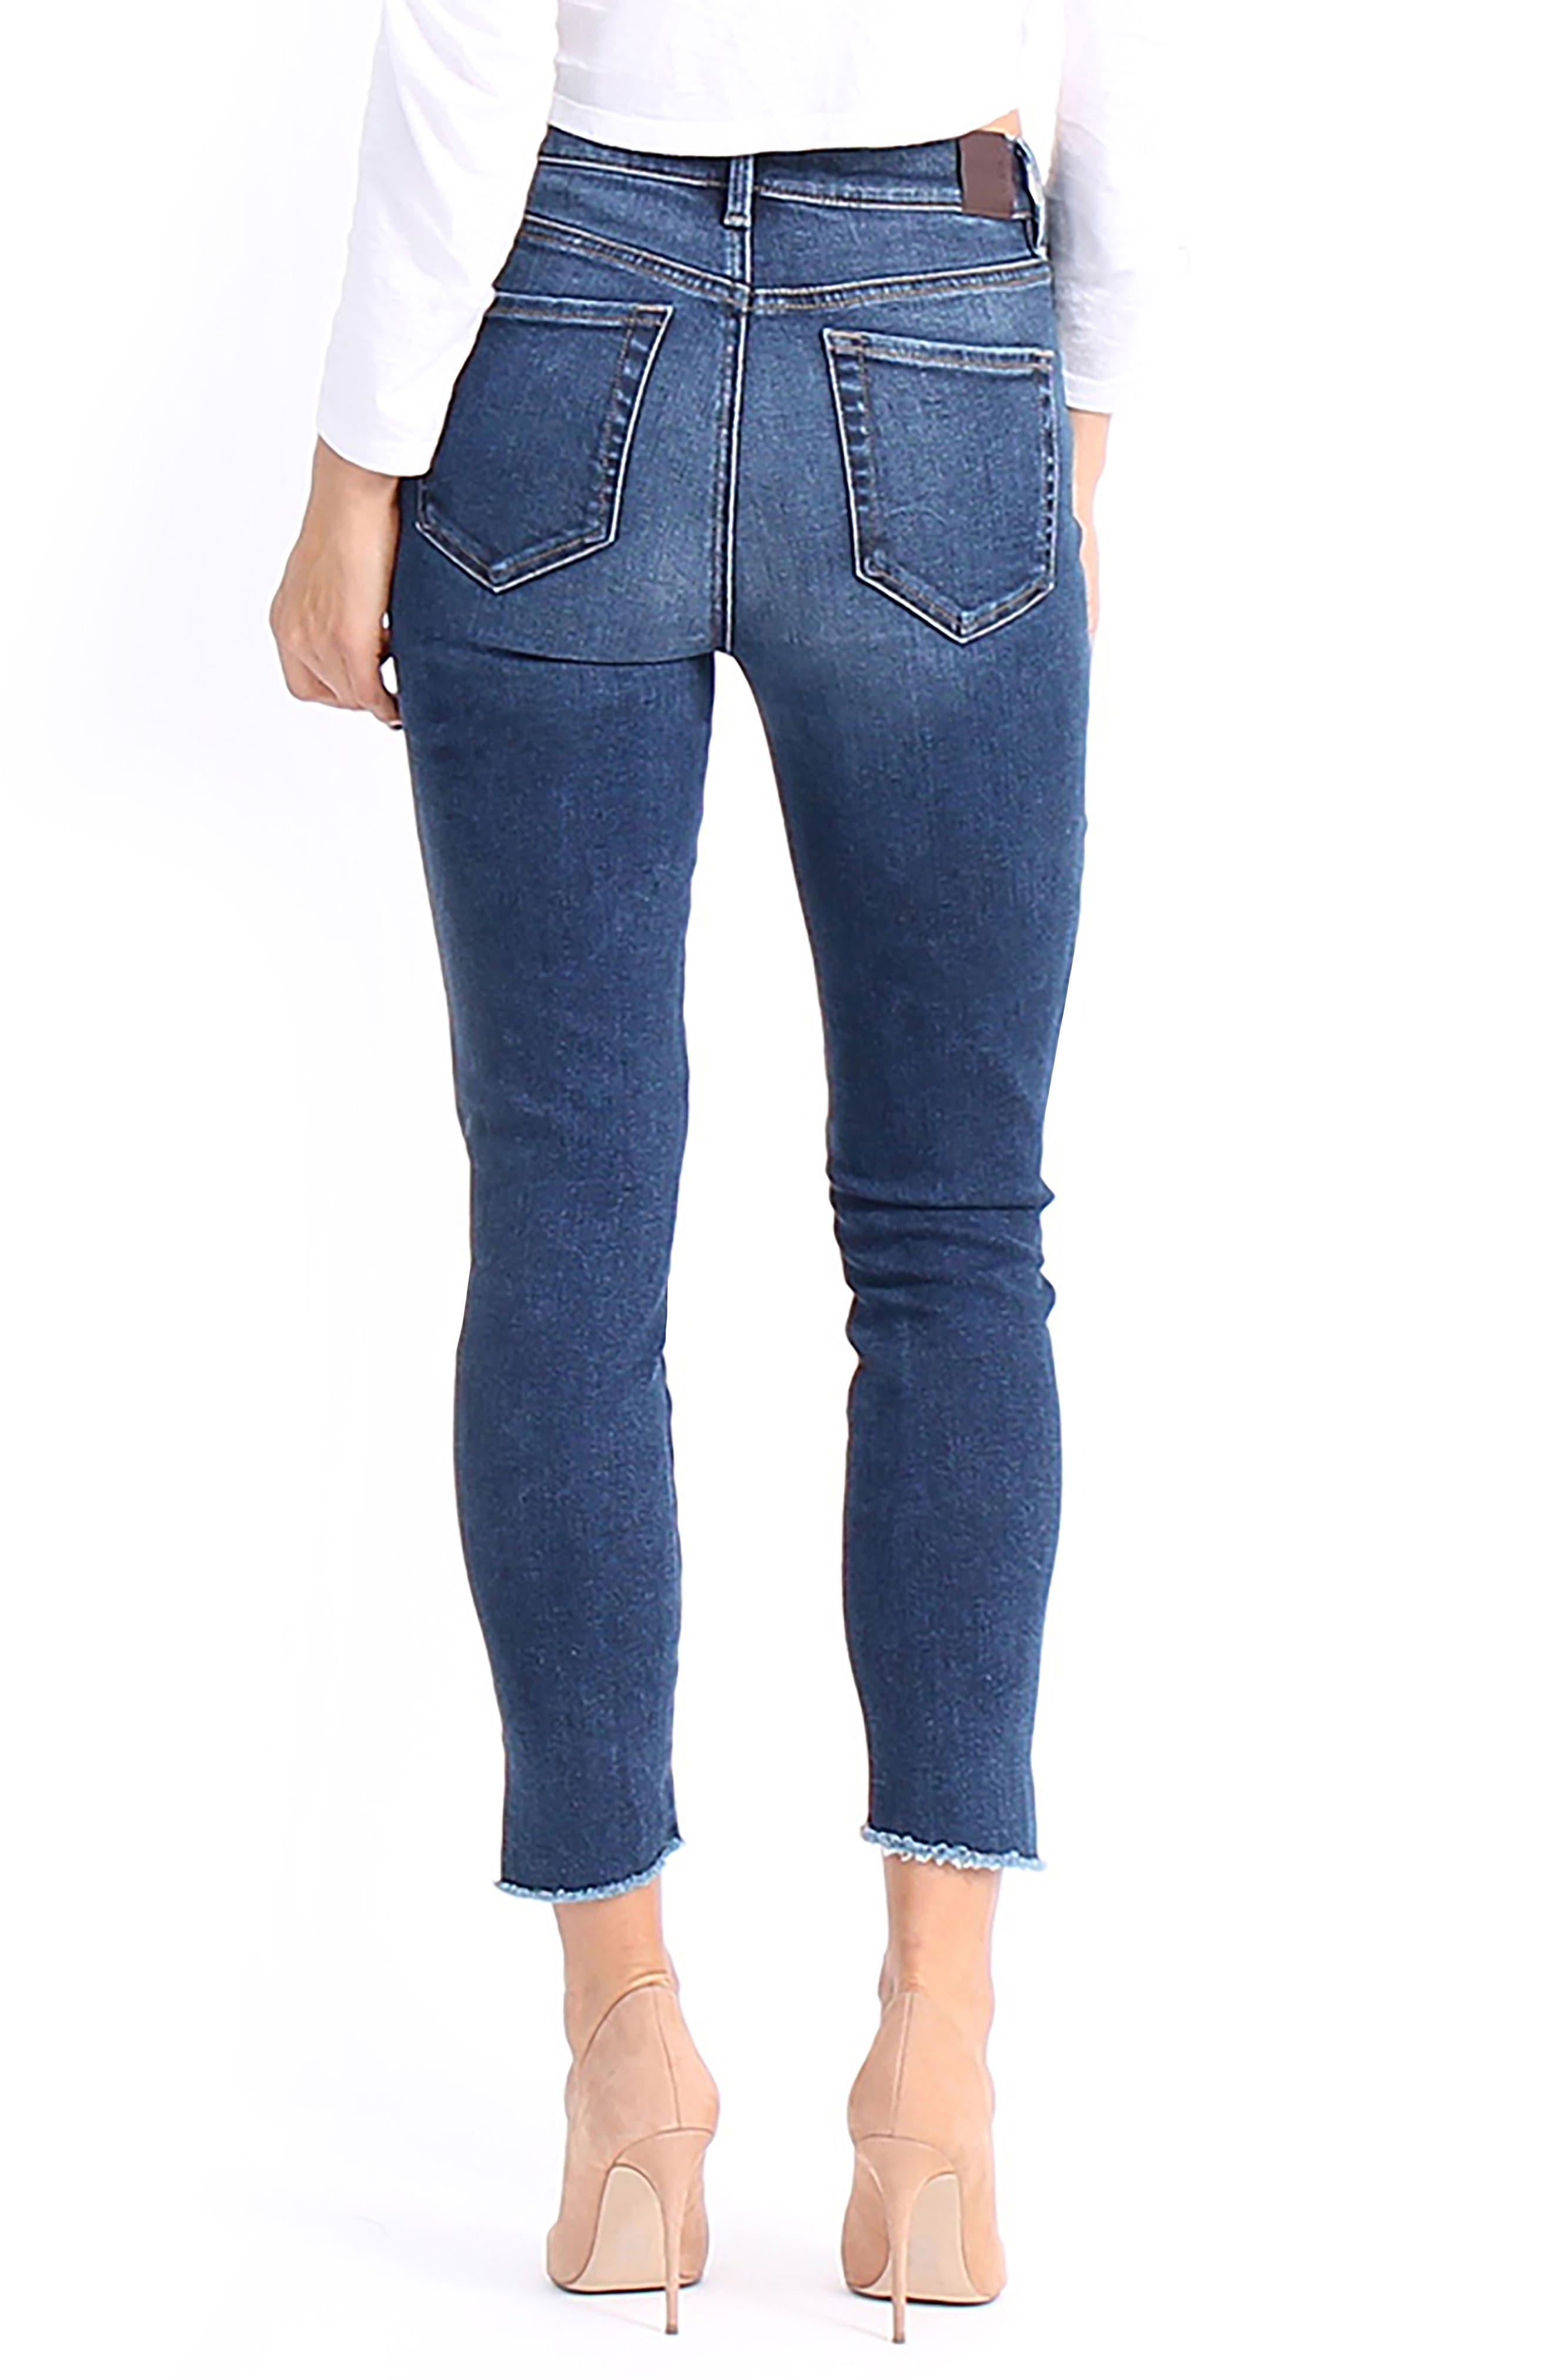 Alternate Image 2  - Level 99 Ellie Uneven Zip Slant Hem Jeans (Women)